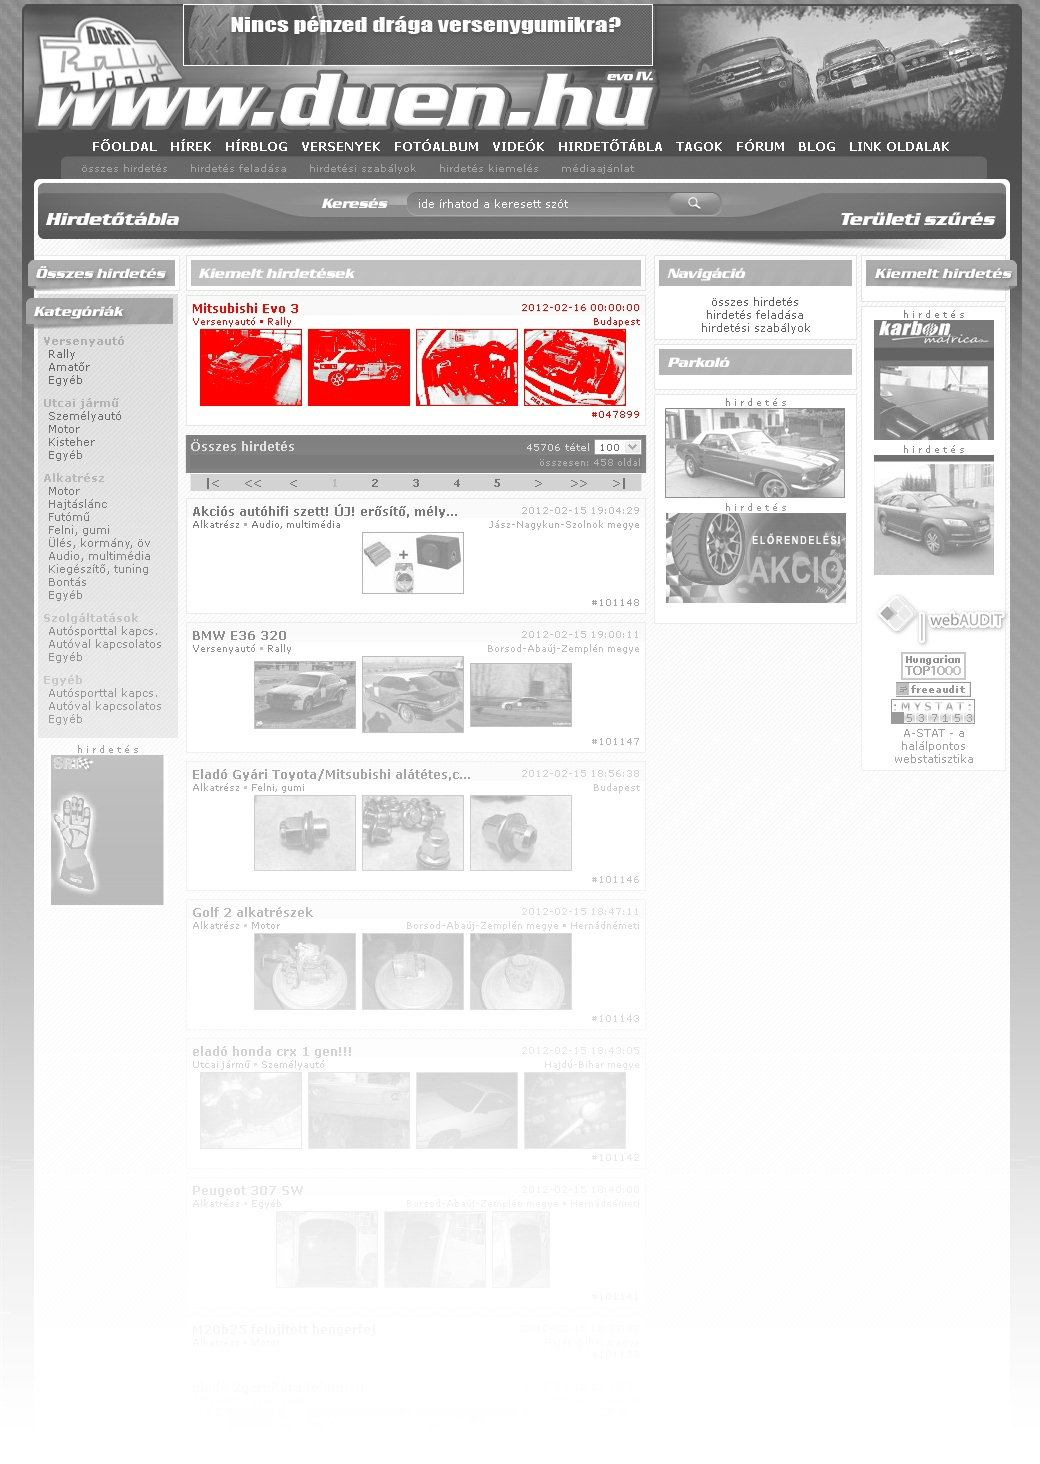 e51f62a054 ... www.duen.hu - kiemelt hirdetés